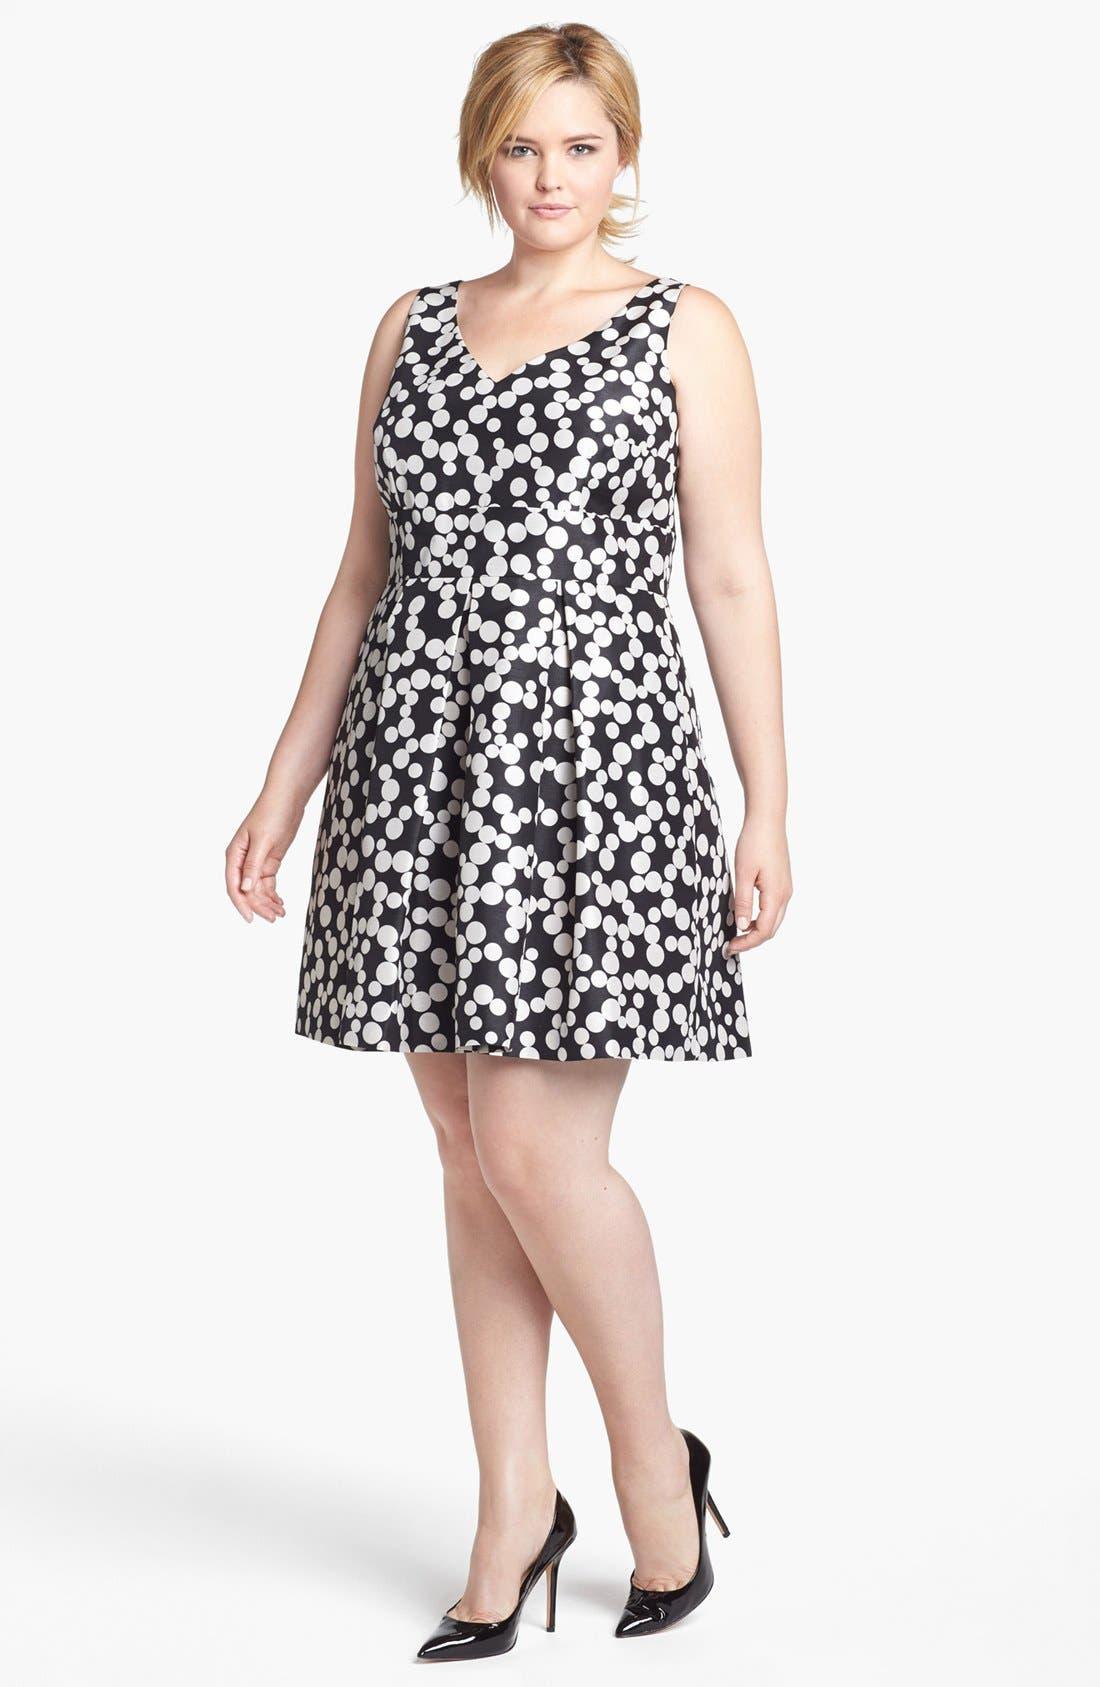 Main Image - Taylor Dresses Polka Dot Fit & Flare Dress (Plus Size)